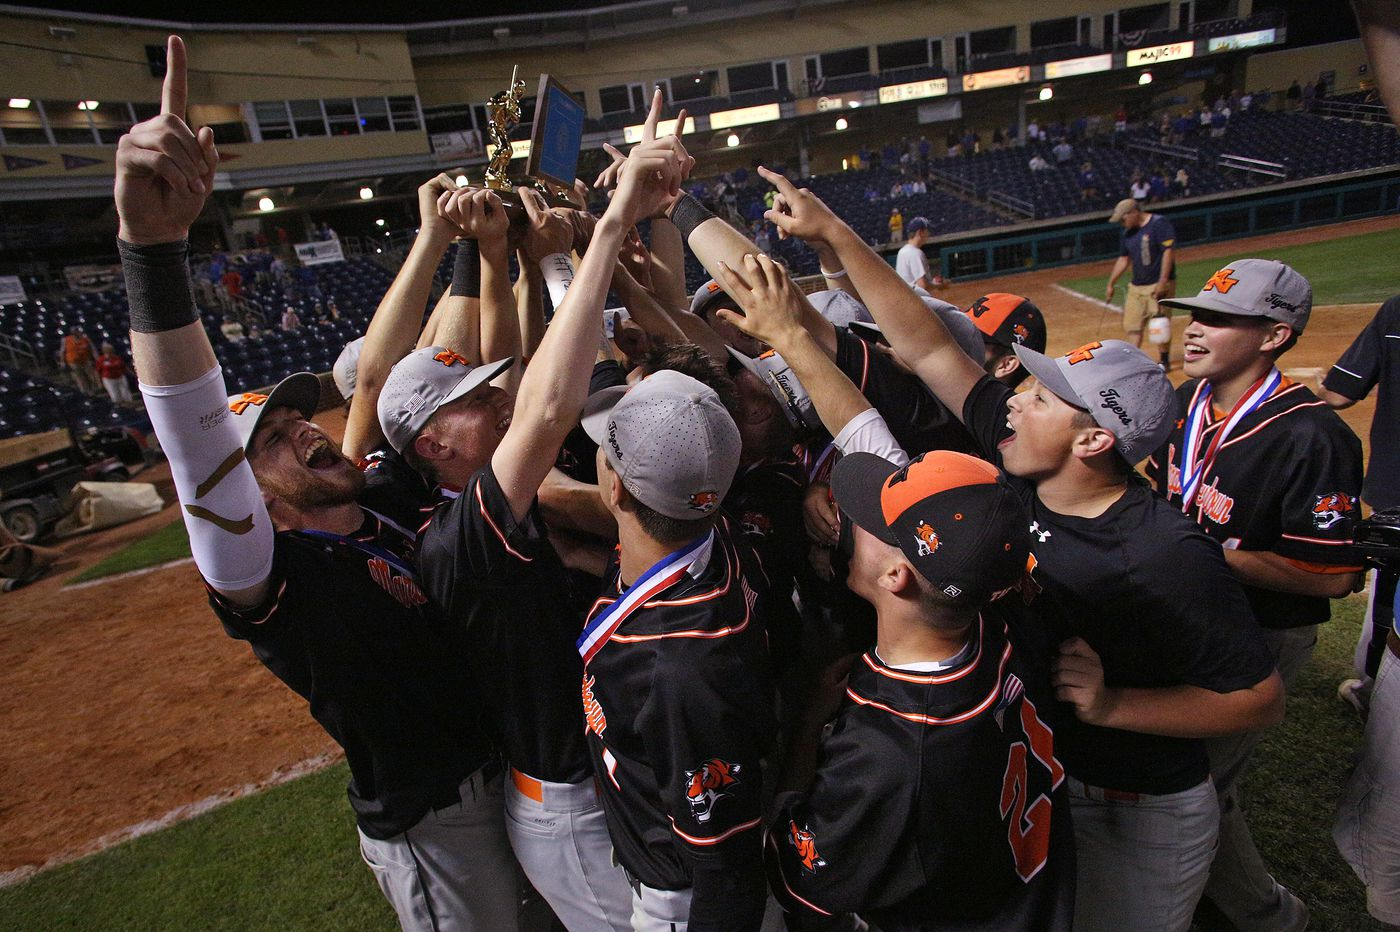 Pa. baseball season in review: Marple Newtown has historic season